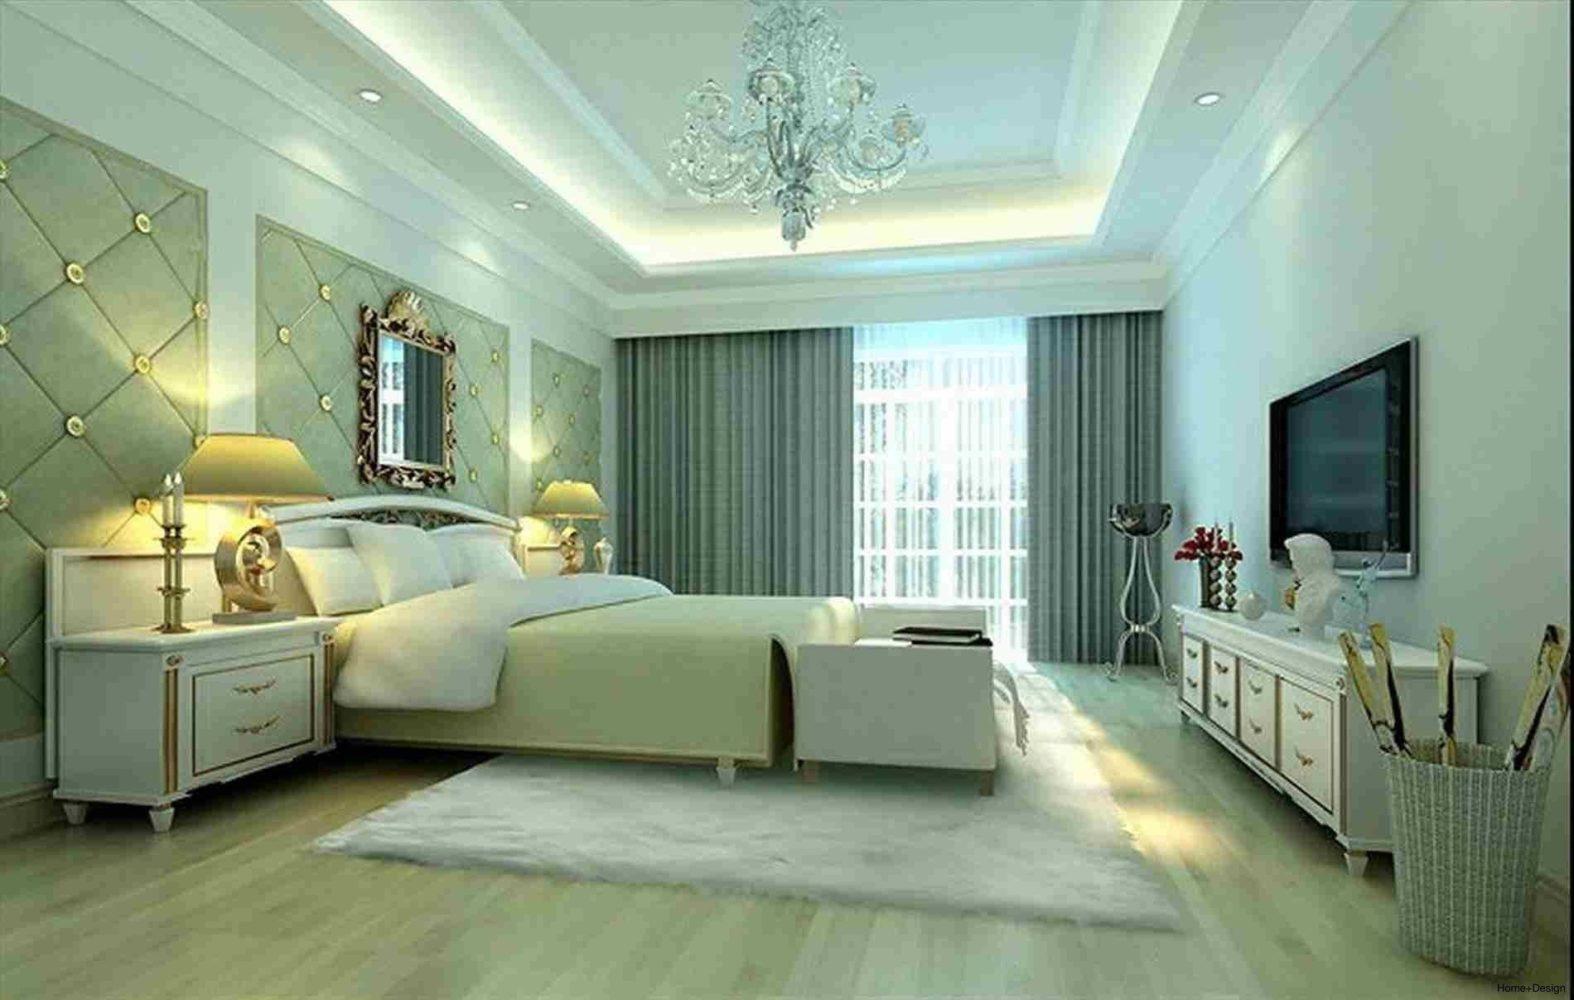 Tray ceiling Design - Taskmasters, Dubai